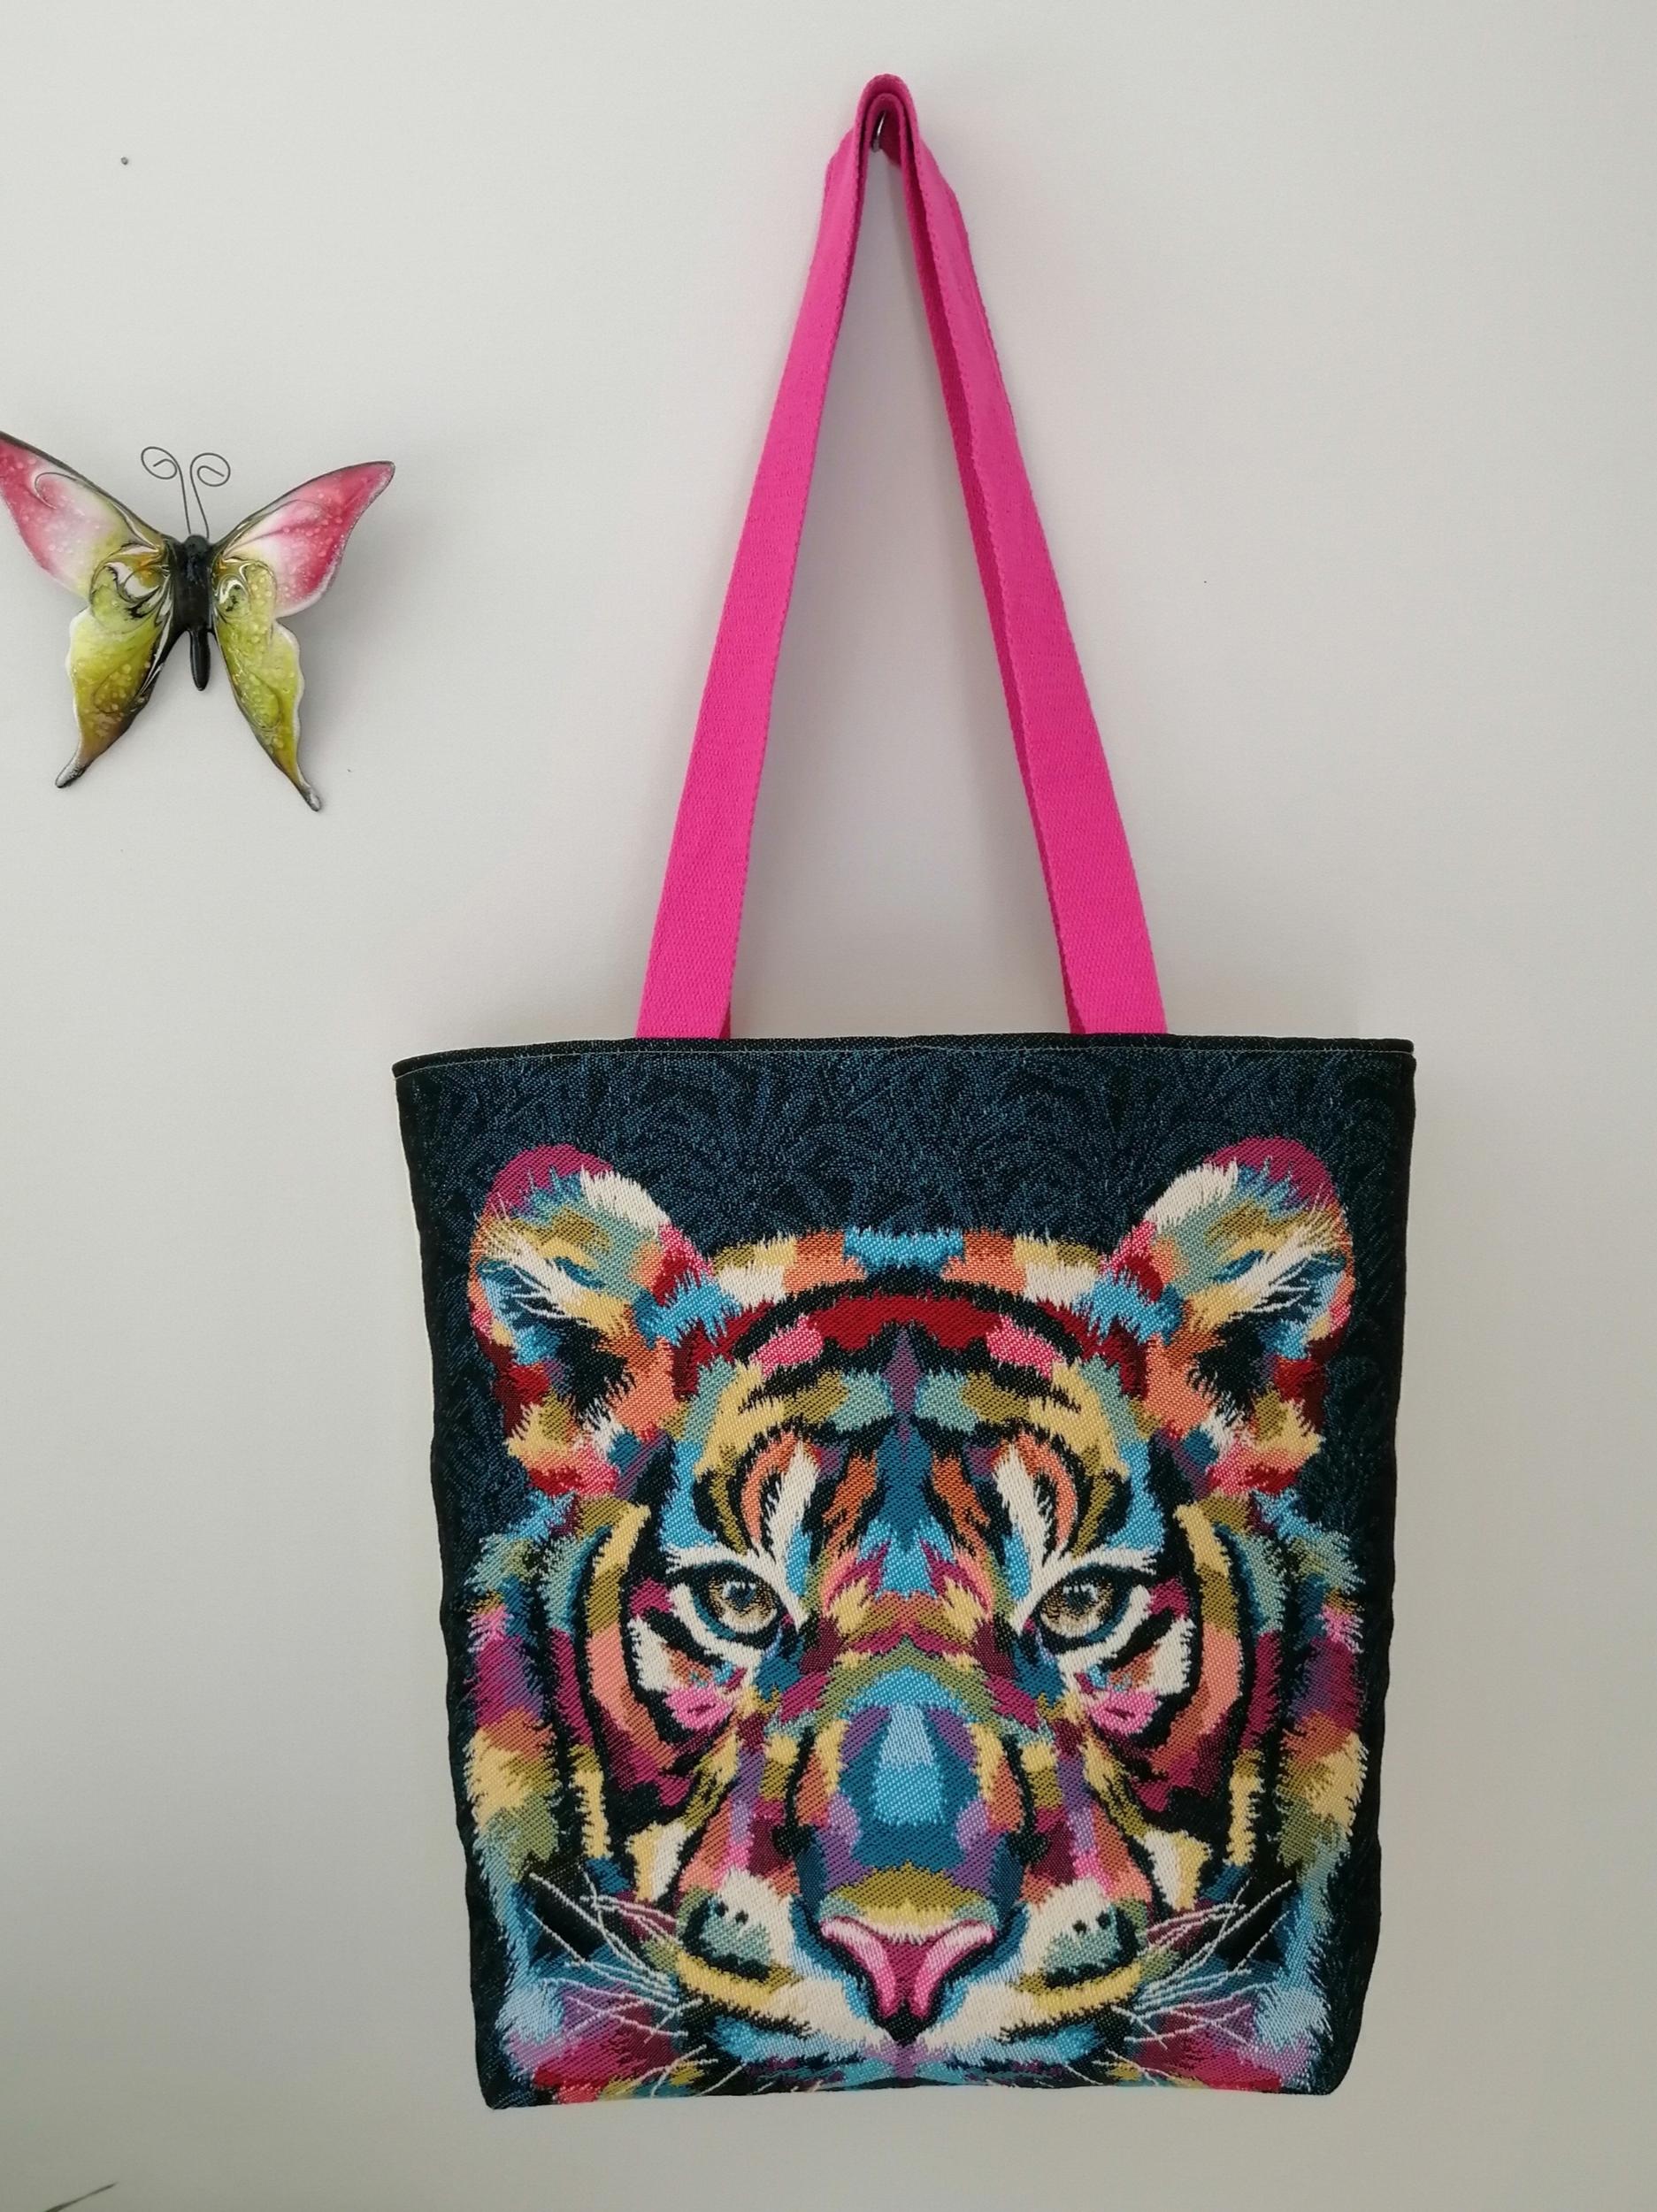 sac à main cabas animaux tigre